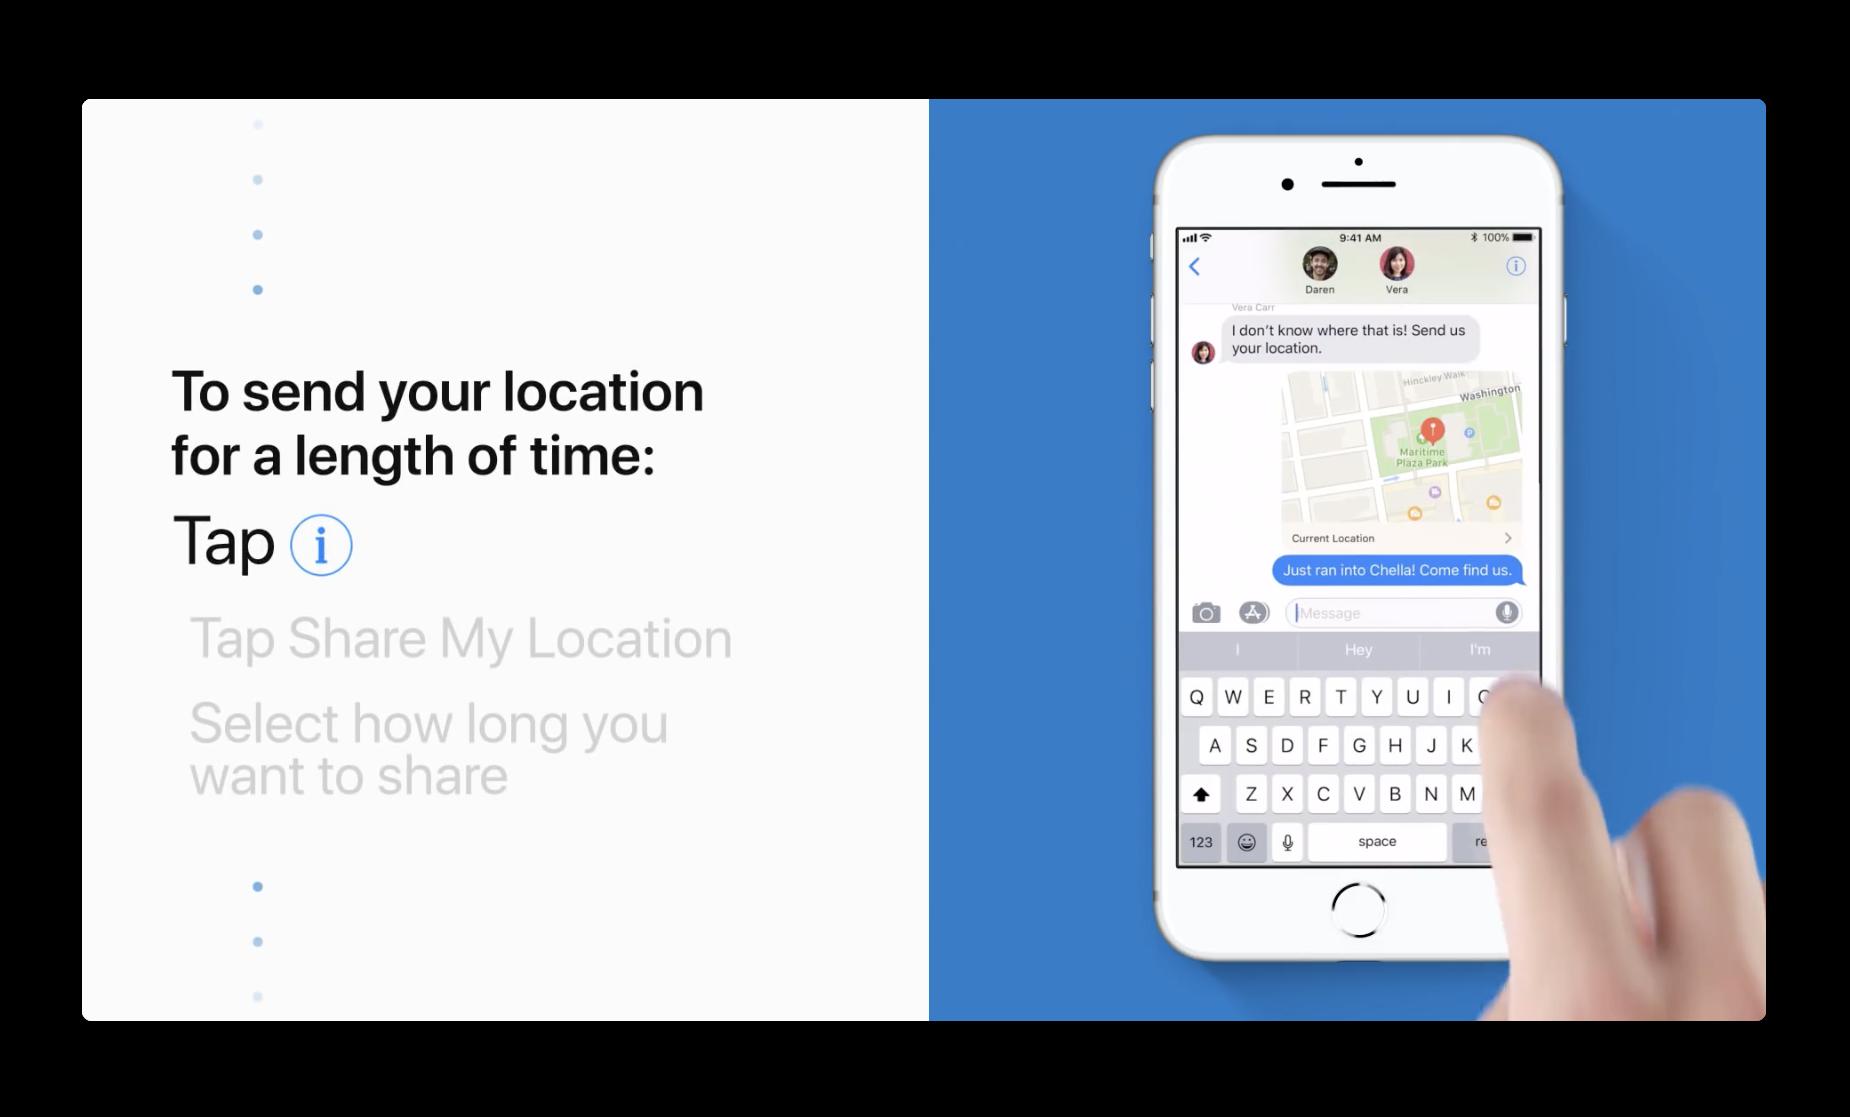 Apple Support、iPhoneから自分のいる場所を共有する方法のビデオを公開